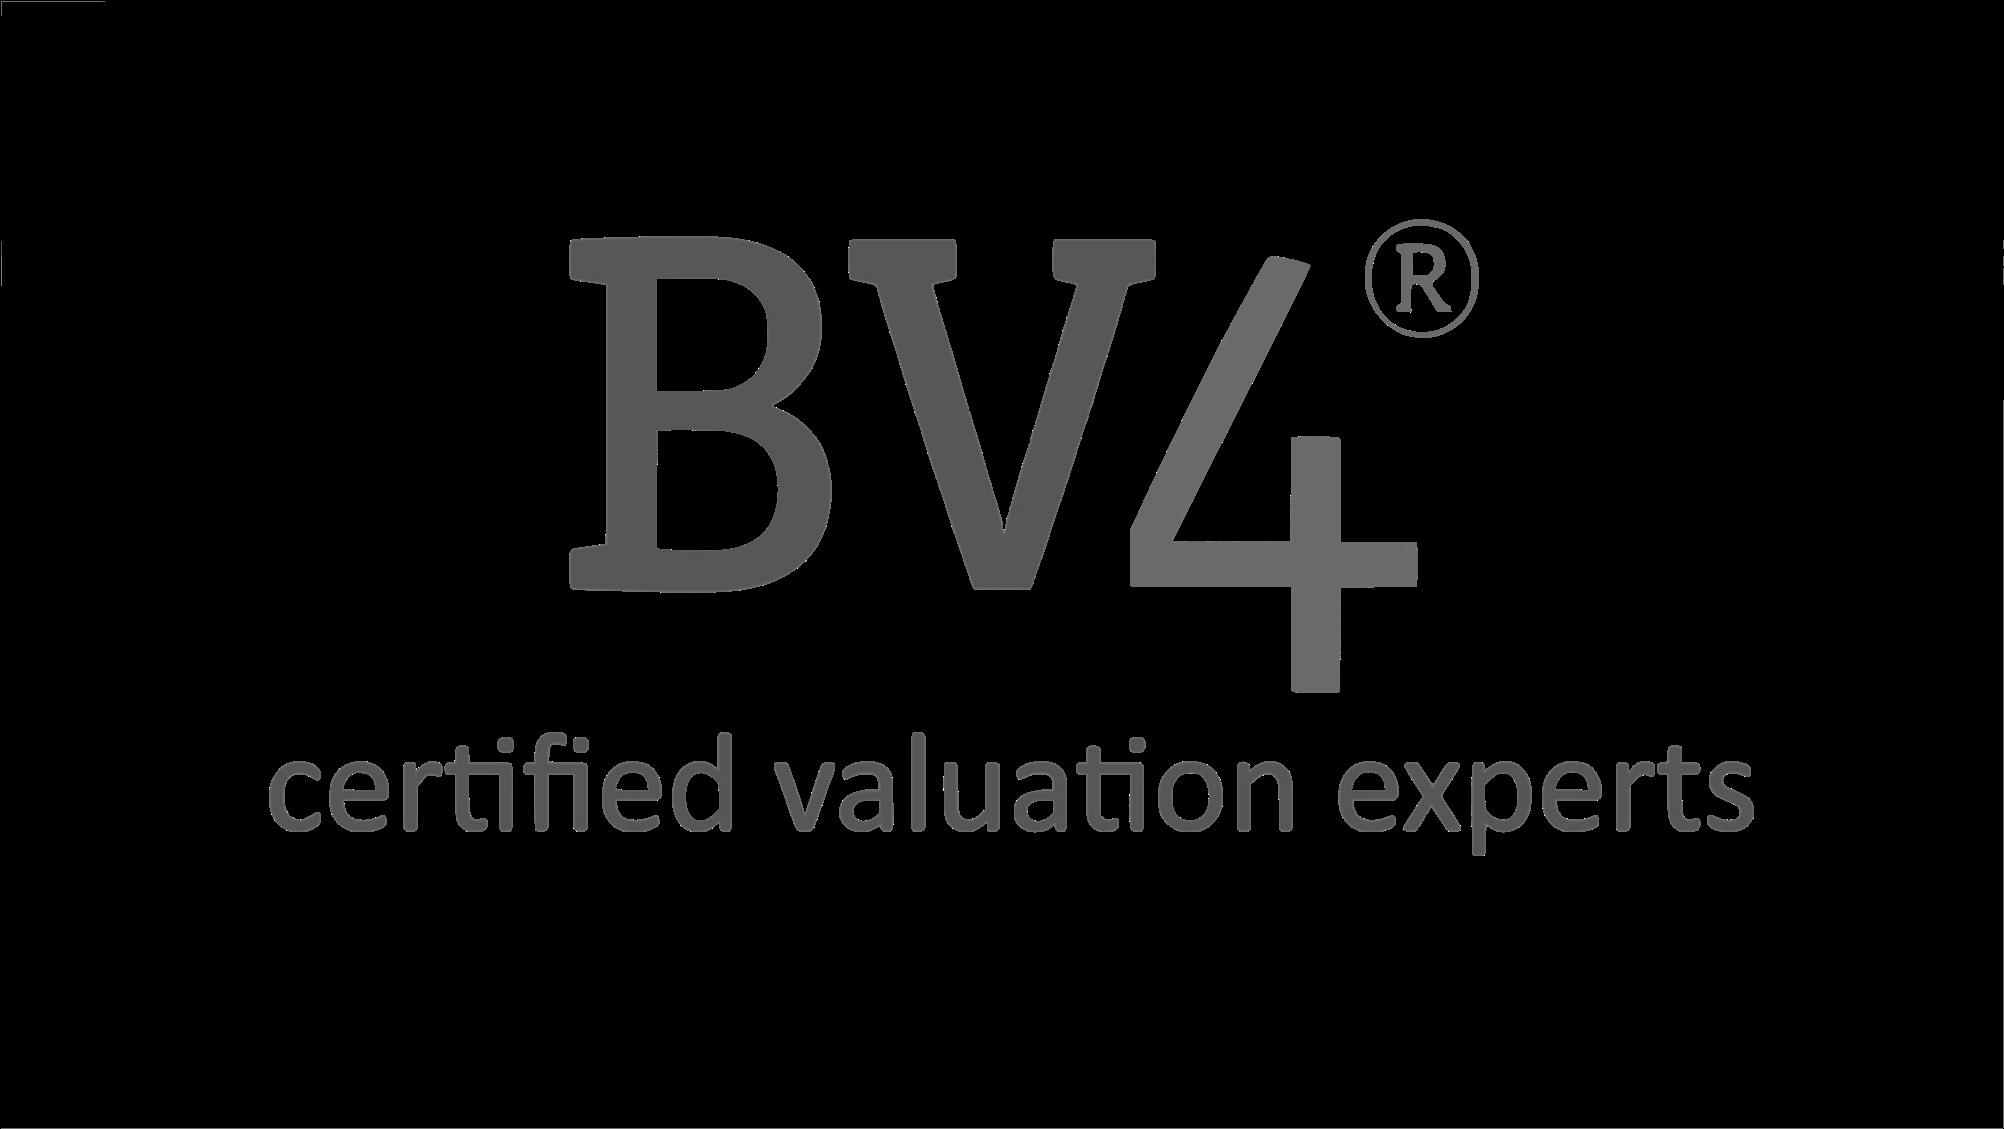 www.bv4.ch